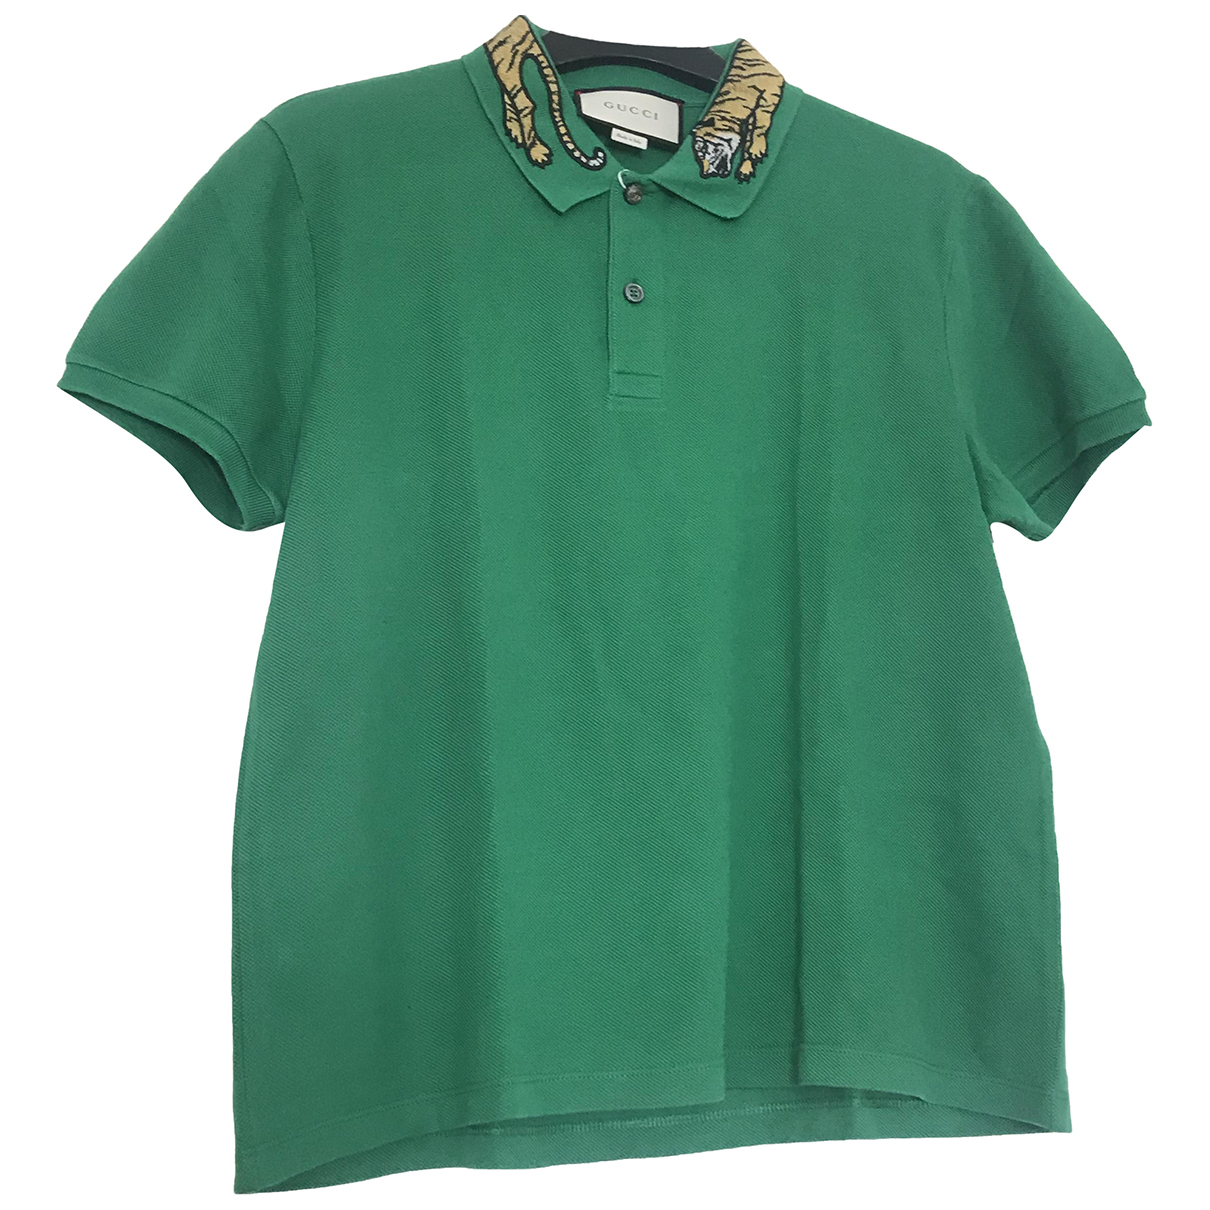 Gucci \N Poloshirts in  Gruen Baumwolle